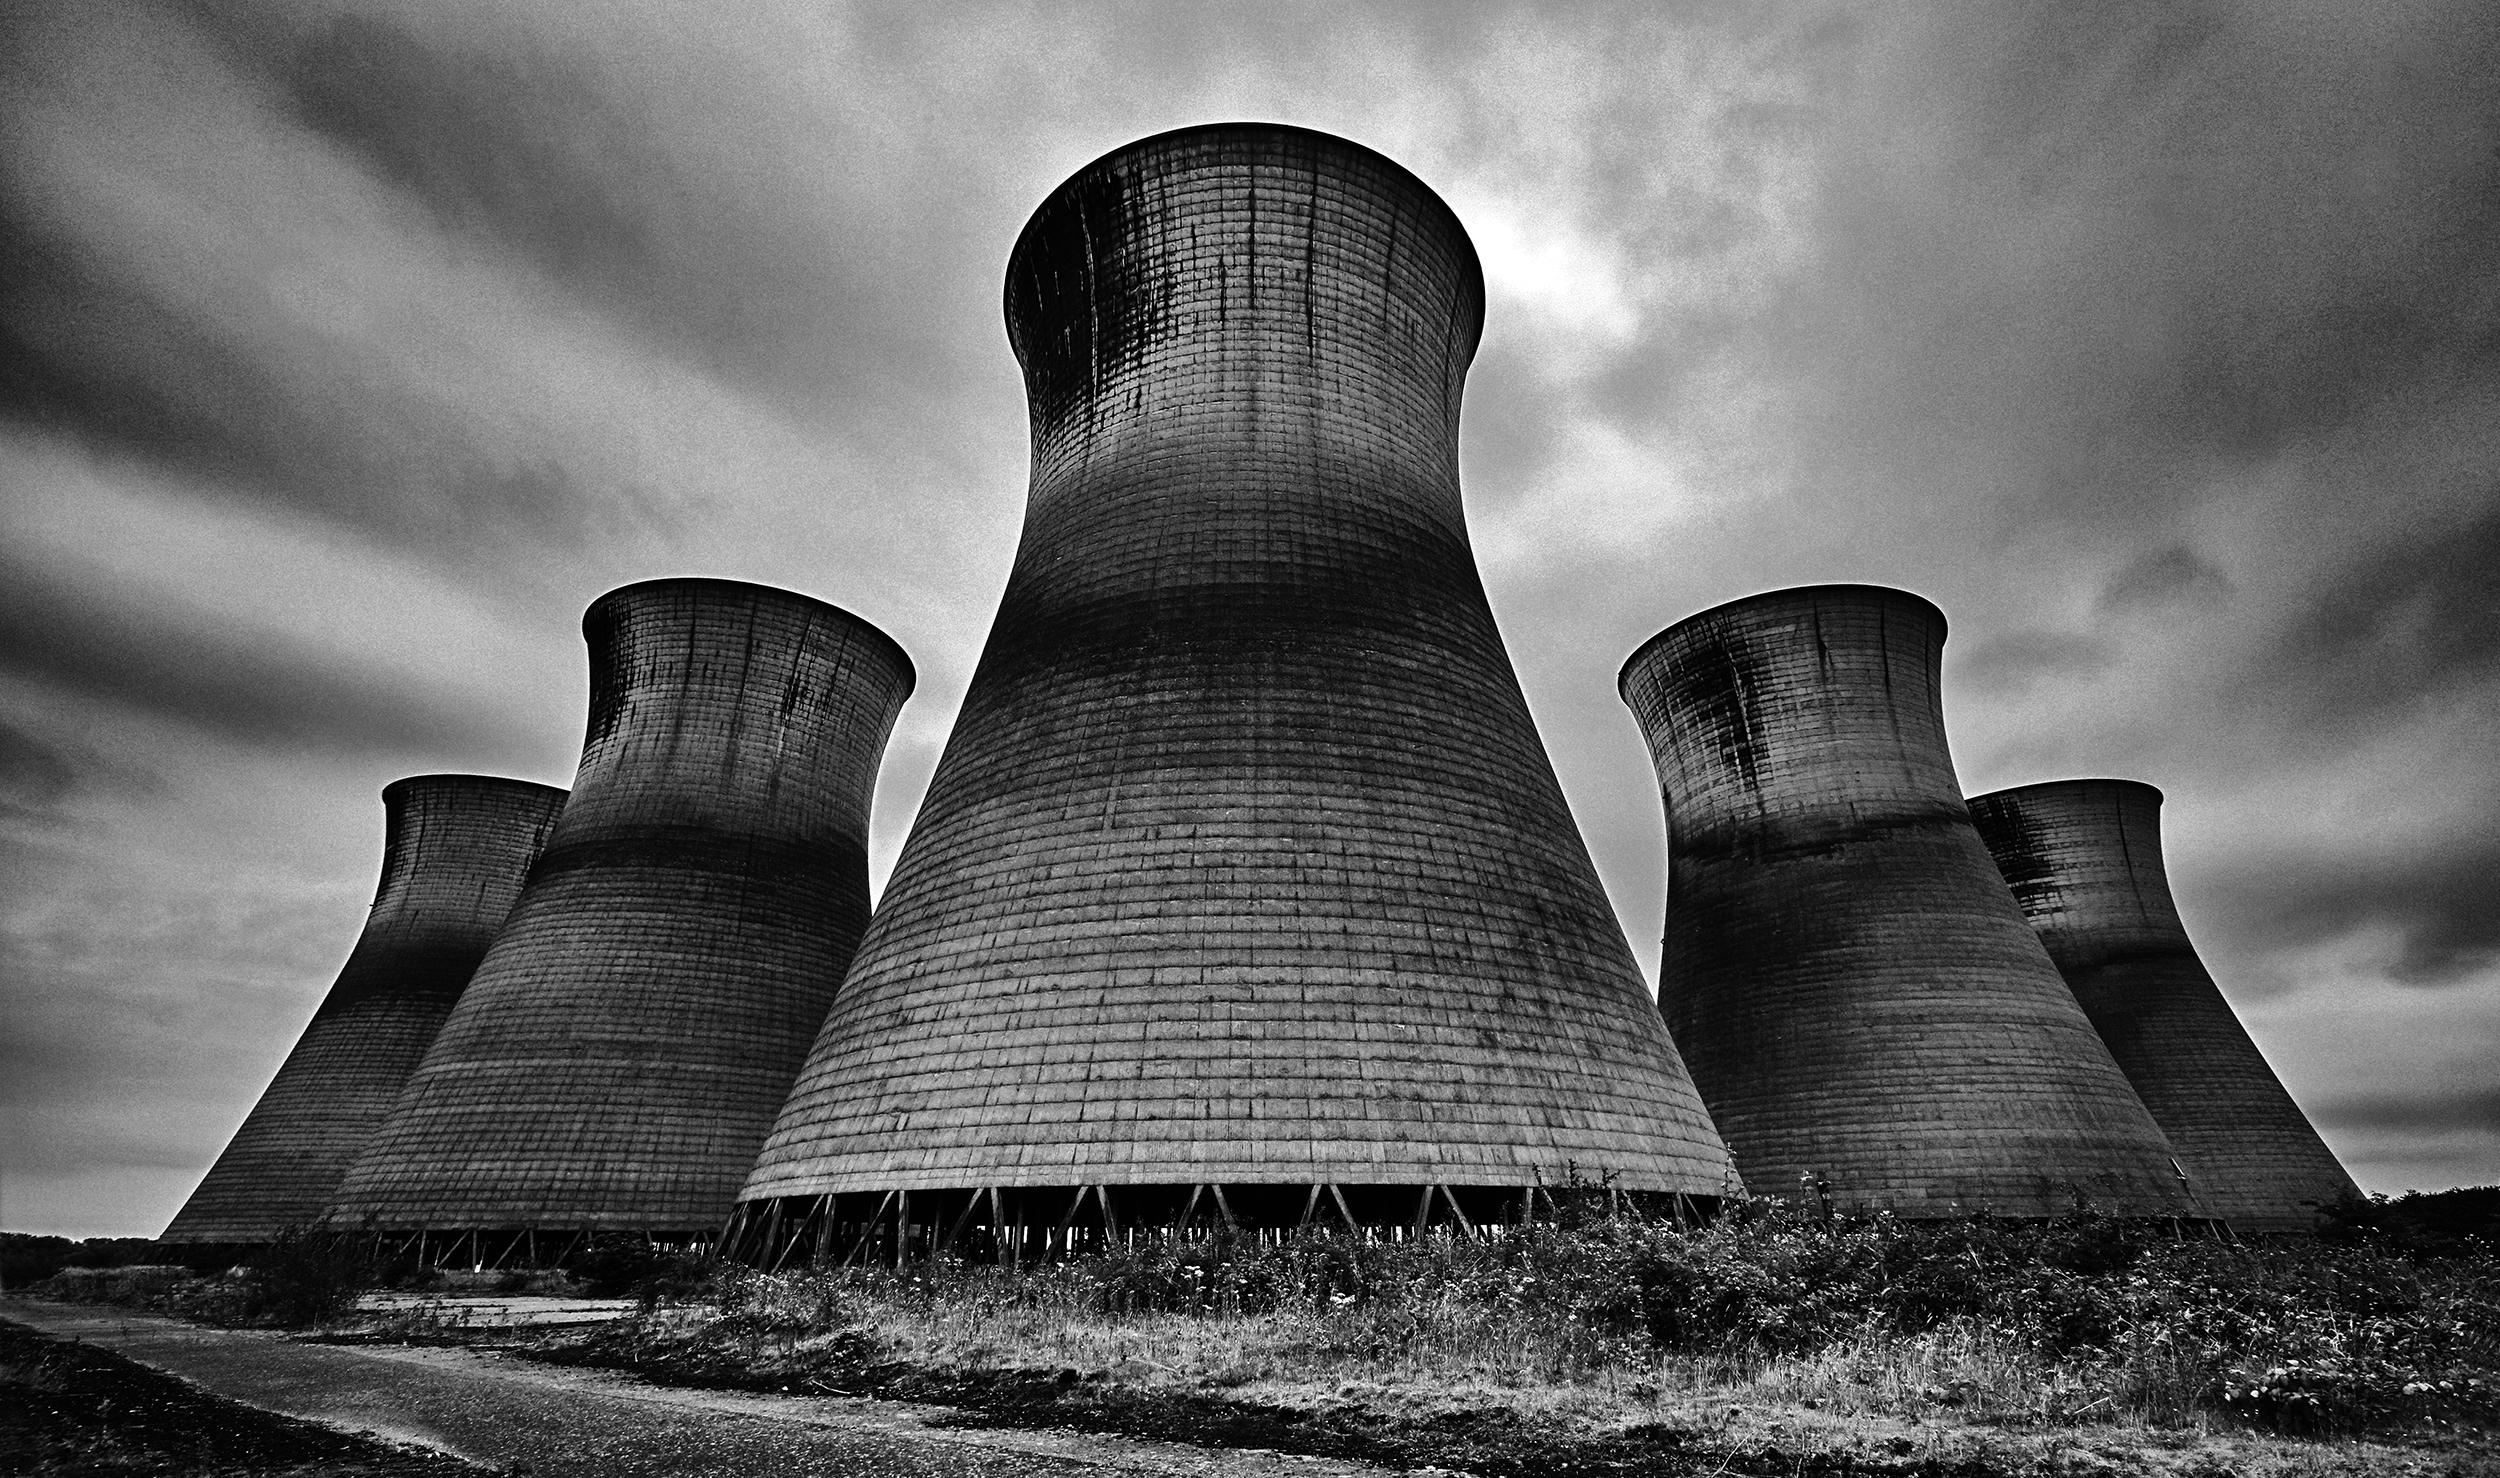 Willington Power station, Derbyshire #2